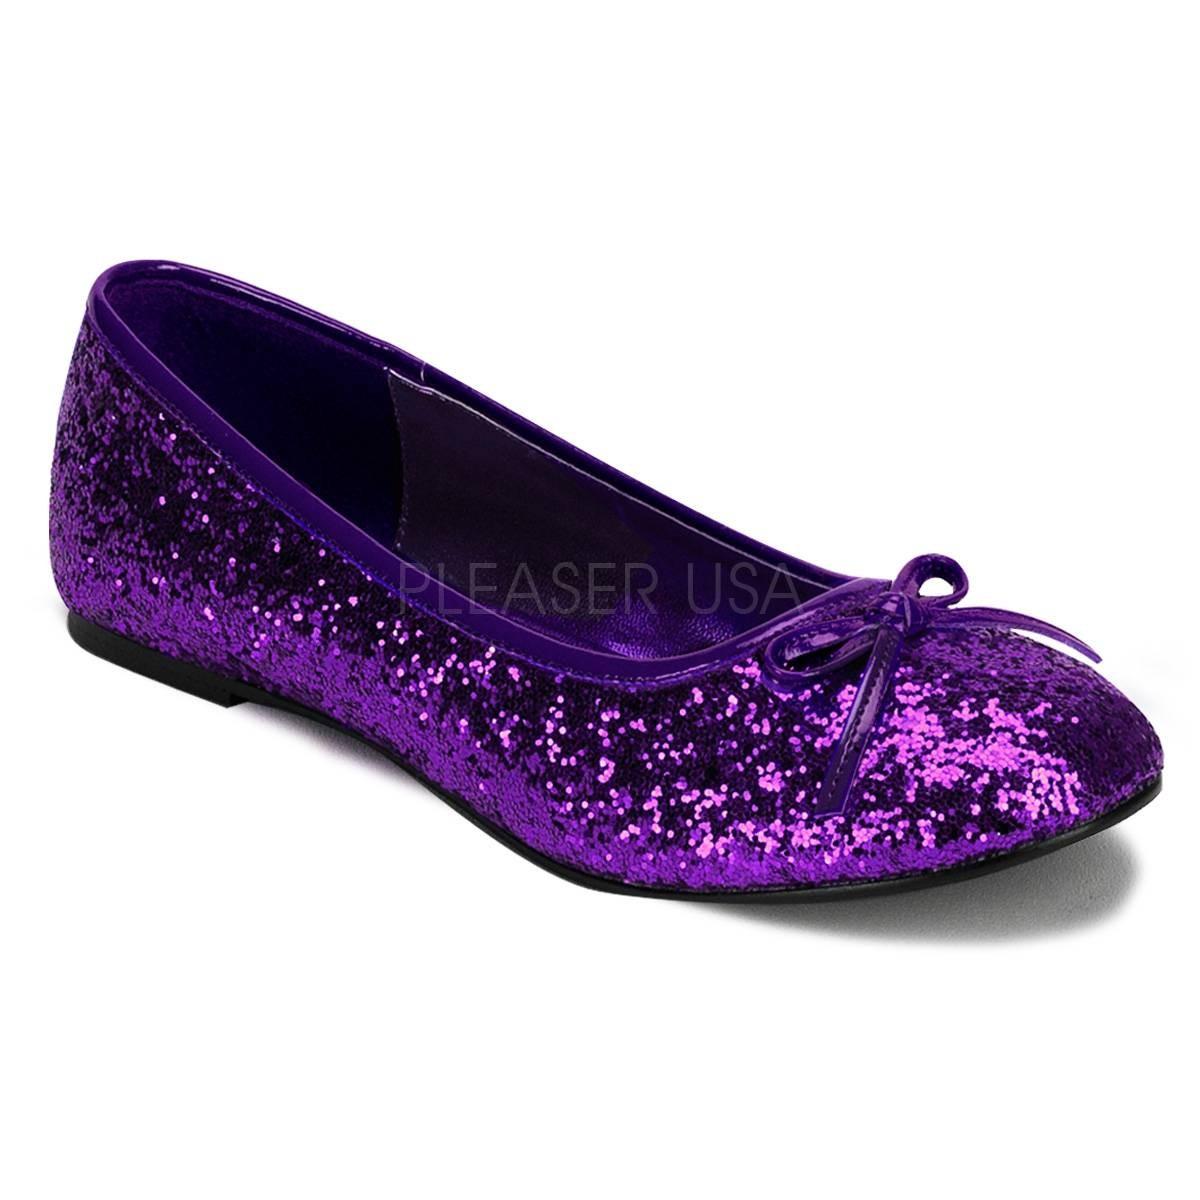 Ballerinas - STAR 16G ° Damen Ballerina ° Violett Glitter ° Funtasma  - Onlineshop RedSixty